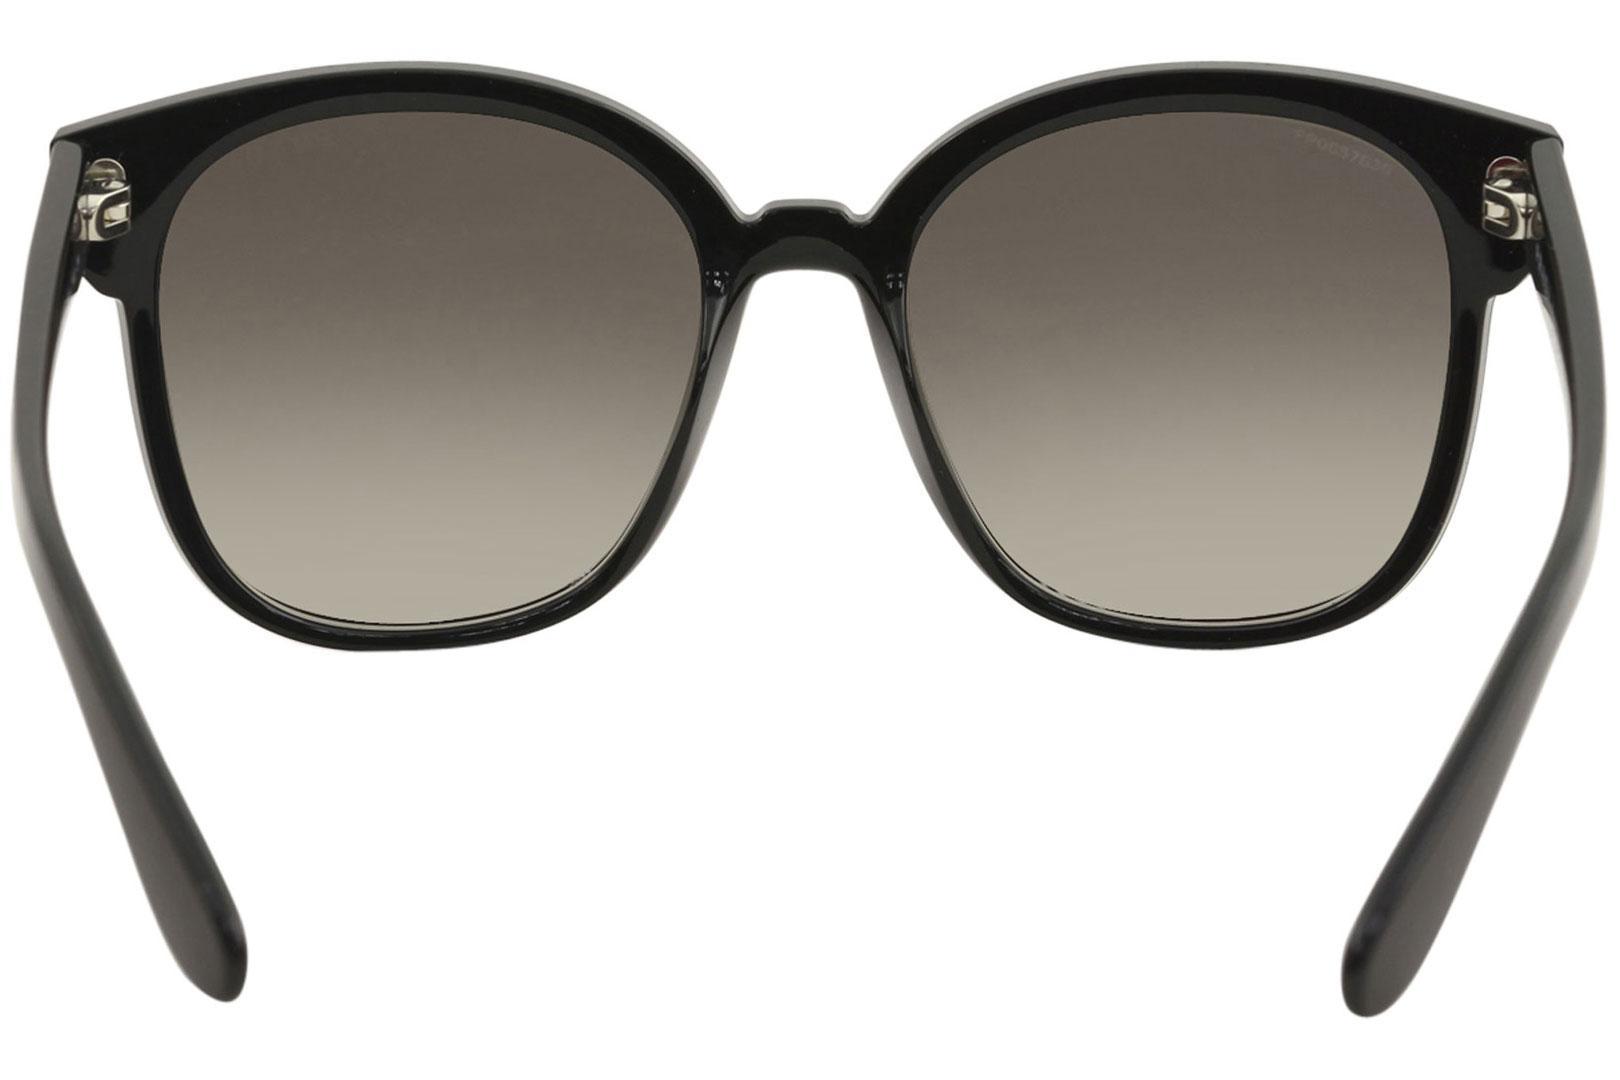 4add0cfaa409d Prada Women s SPR05U SPR 05U Fashion Square Sunglasses by Prada. 123